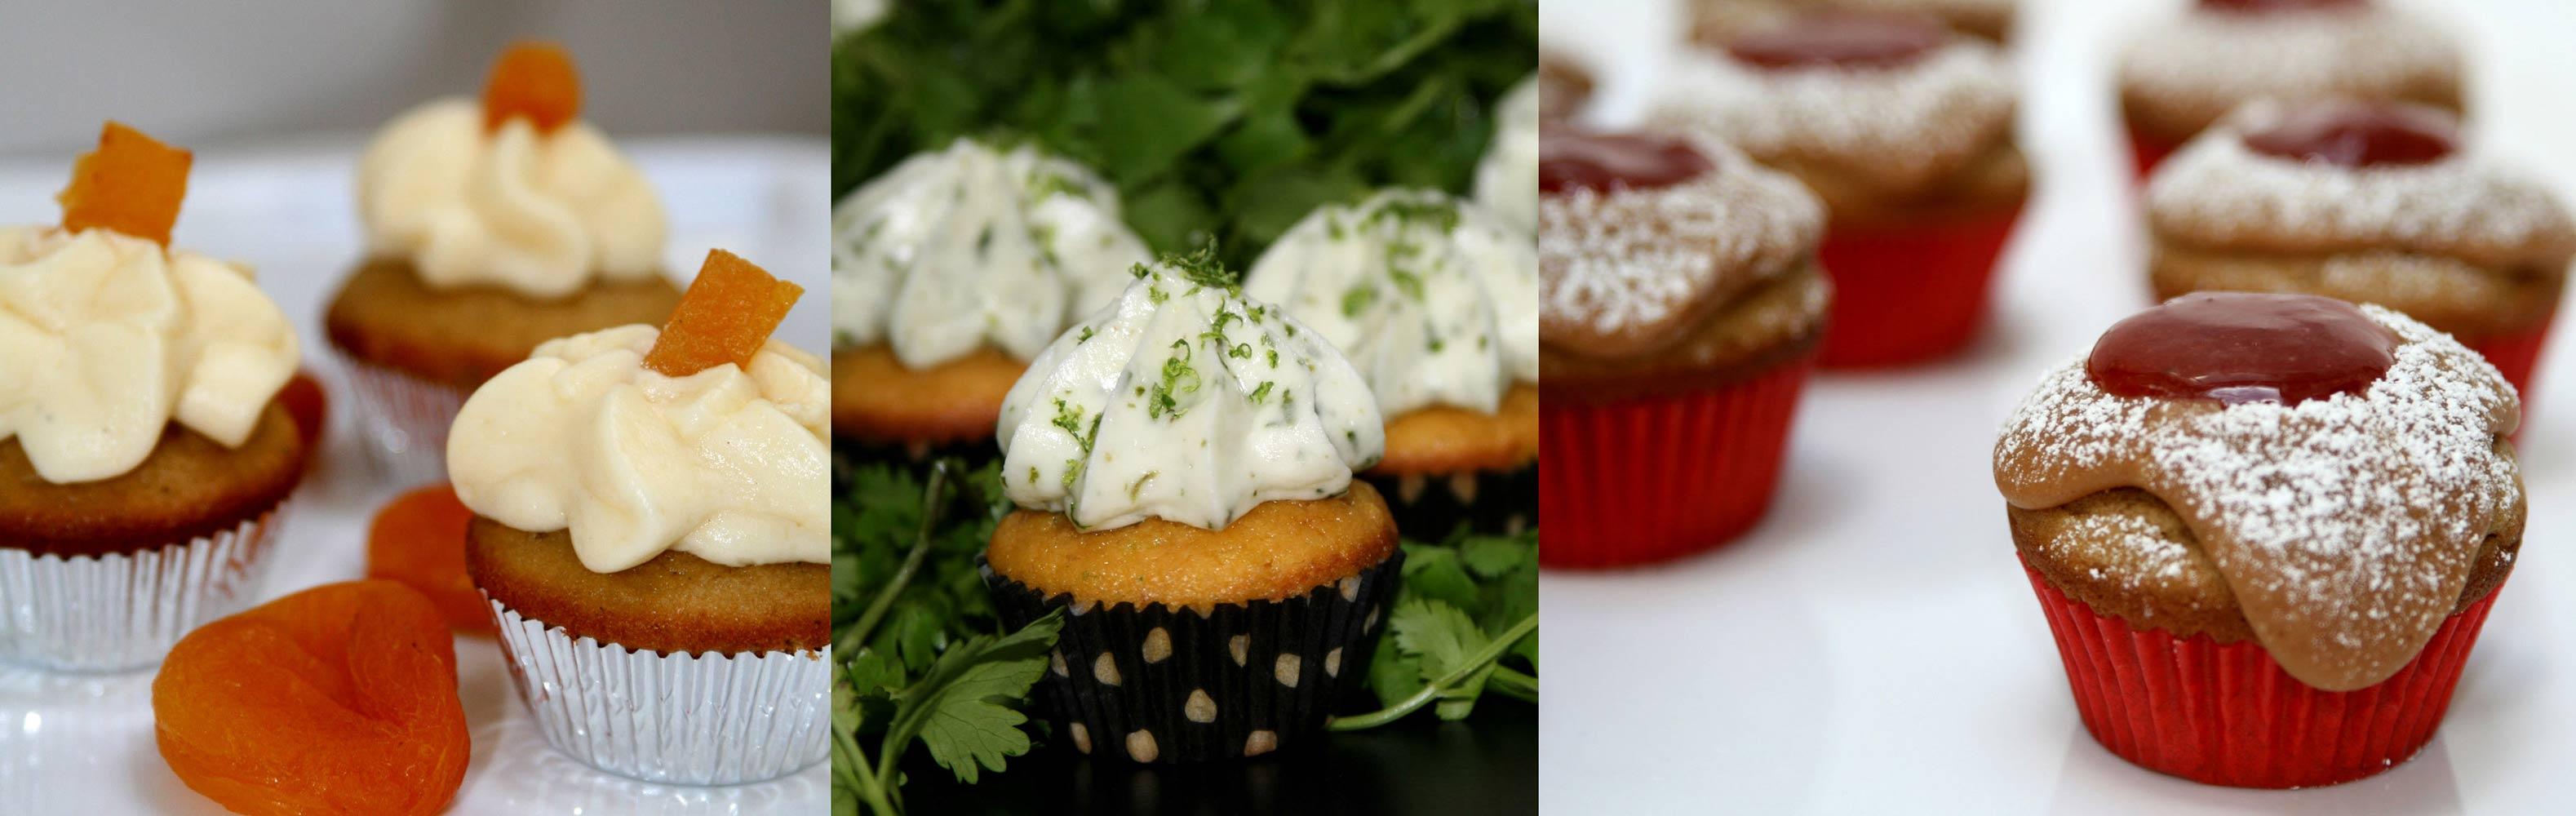 AW-cupcakes